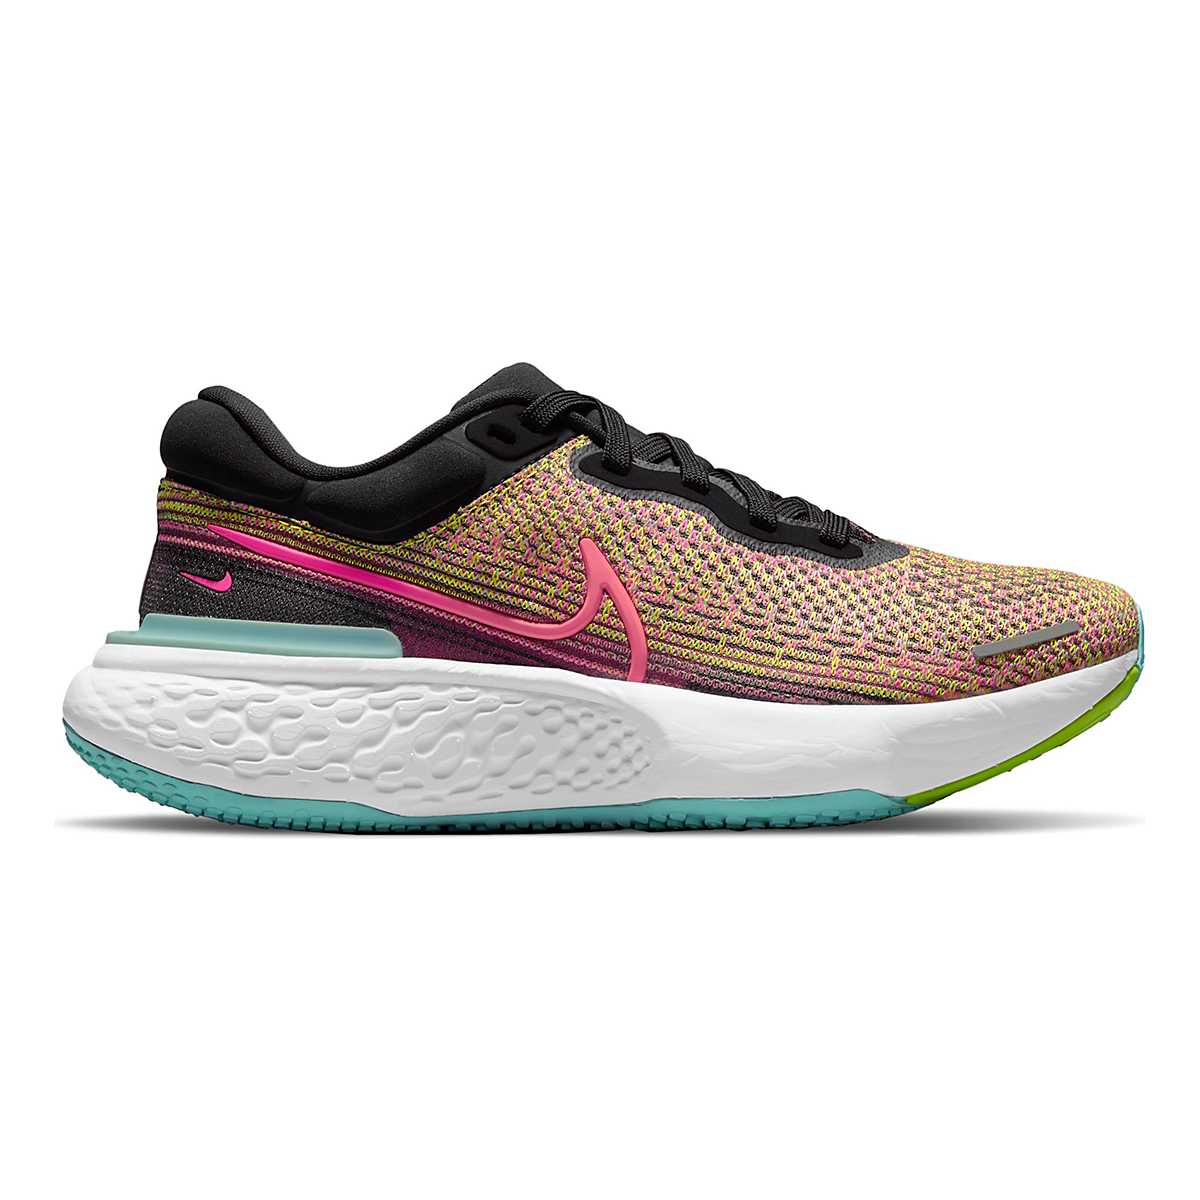 Women's Nike Zoomx Invincible Run FlyKnit Running Shoe - Color: Volt/Bright Mango/Black/Light Dew - Size: 5 - Width: Regular, Volt/Bright Mango/Black/Light Dew, large, image 1